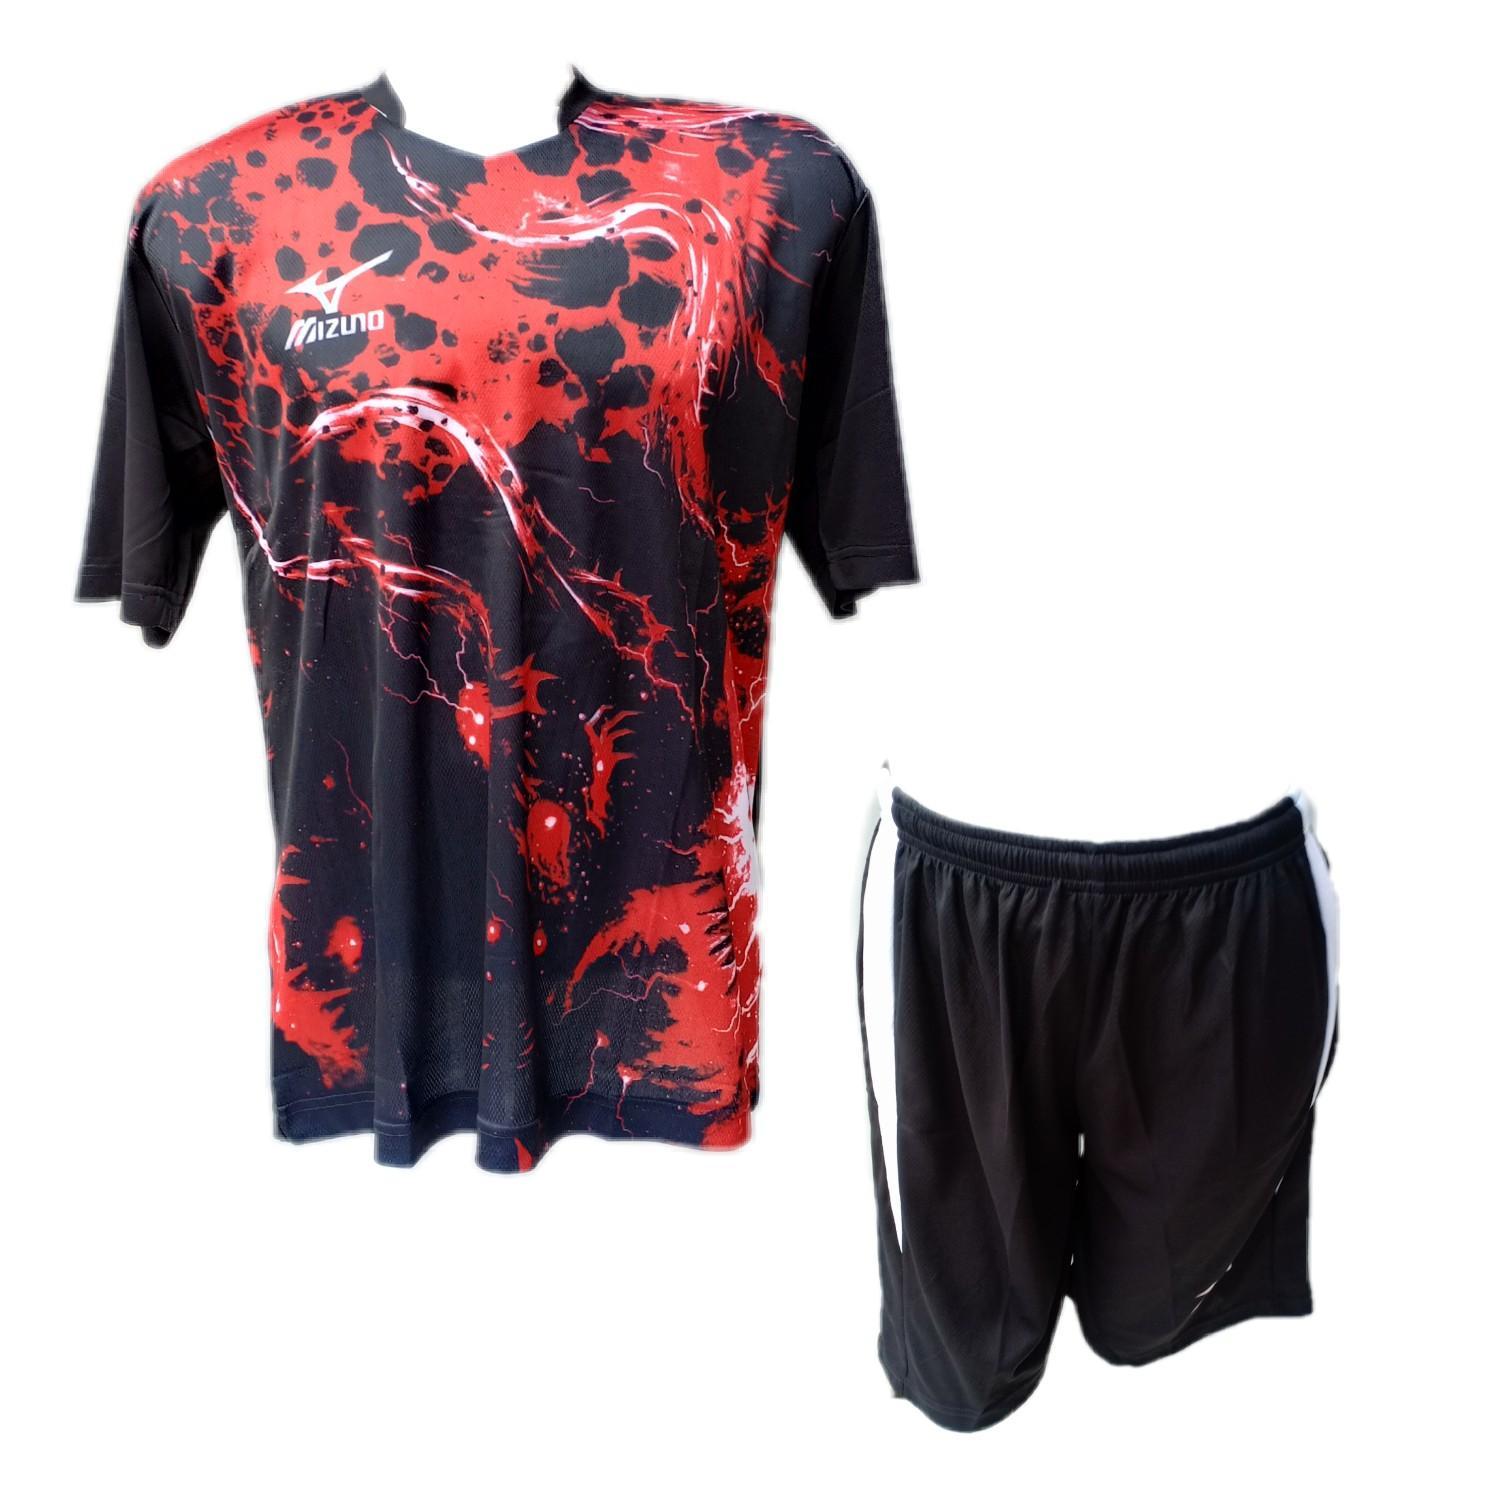 Fitur Baru Dijual Panas Pria Olahraga Jersey Kiper Sepak Bola Baik Sohoku Kalung Taring Motif Hiu Arsy Sport Pakaian 03 Voli